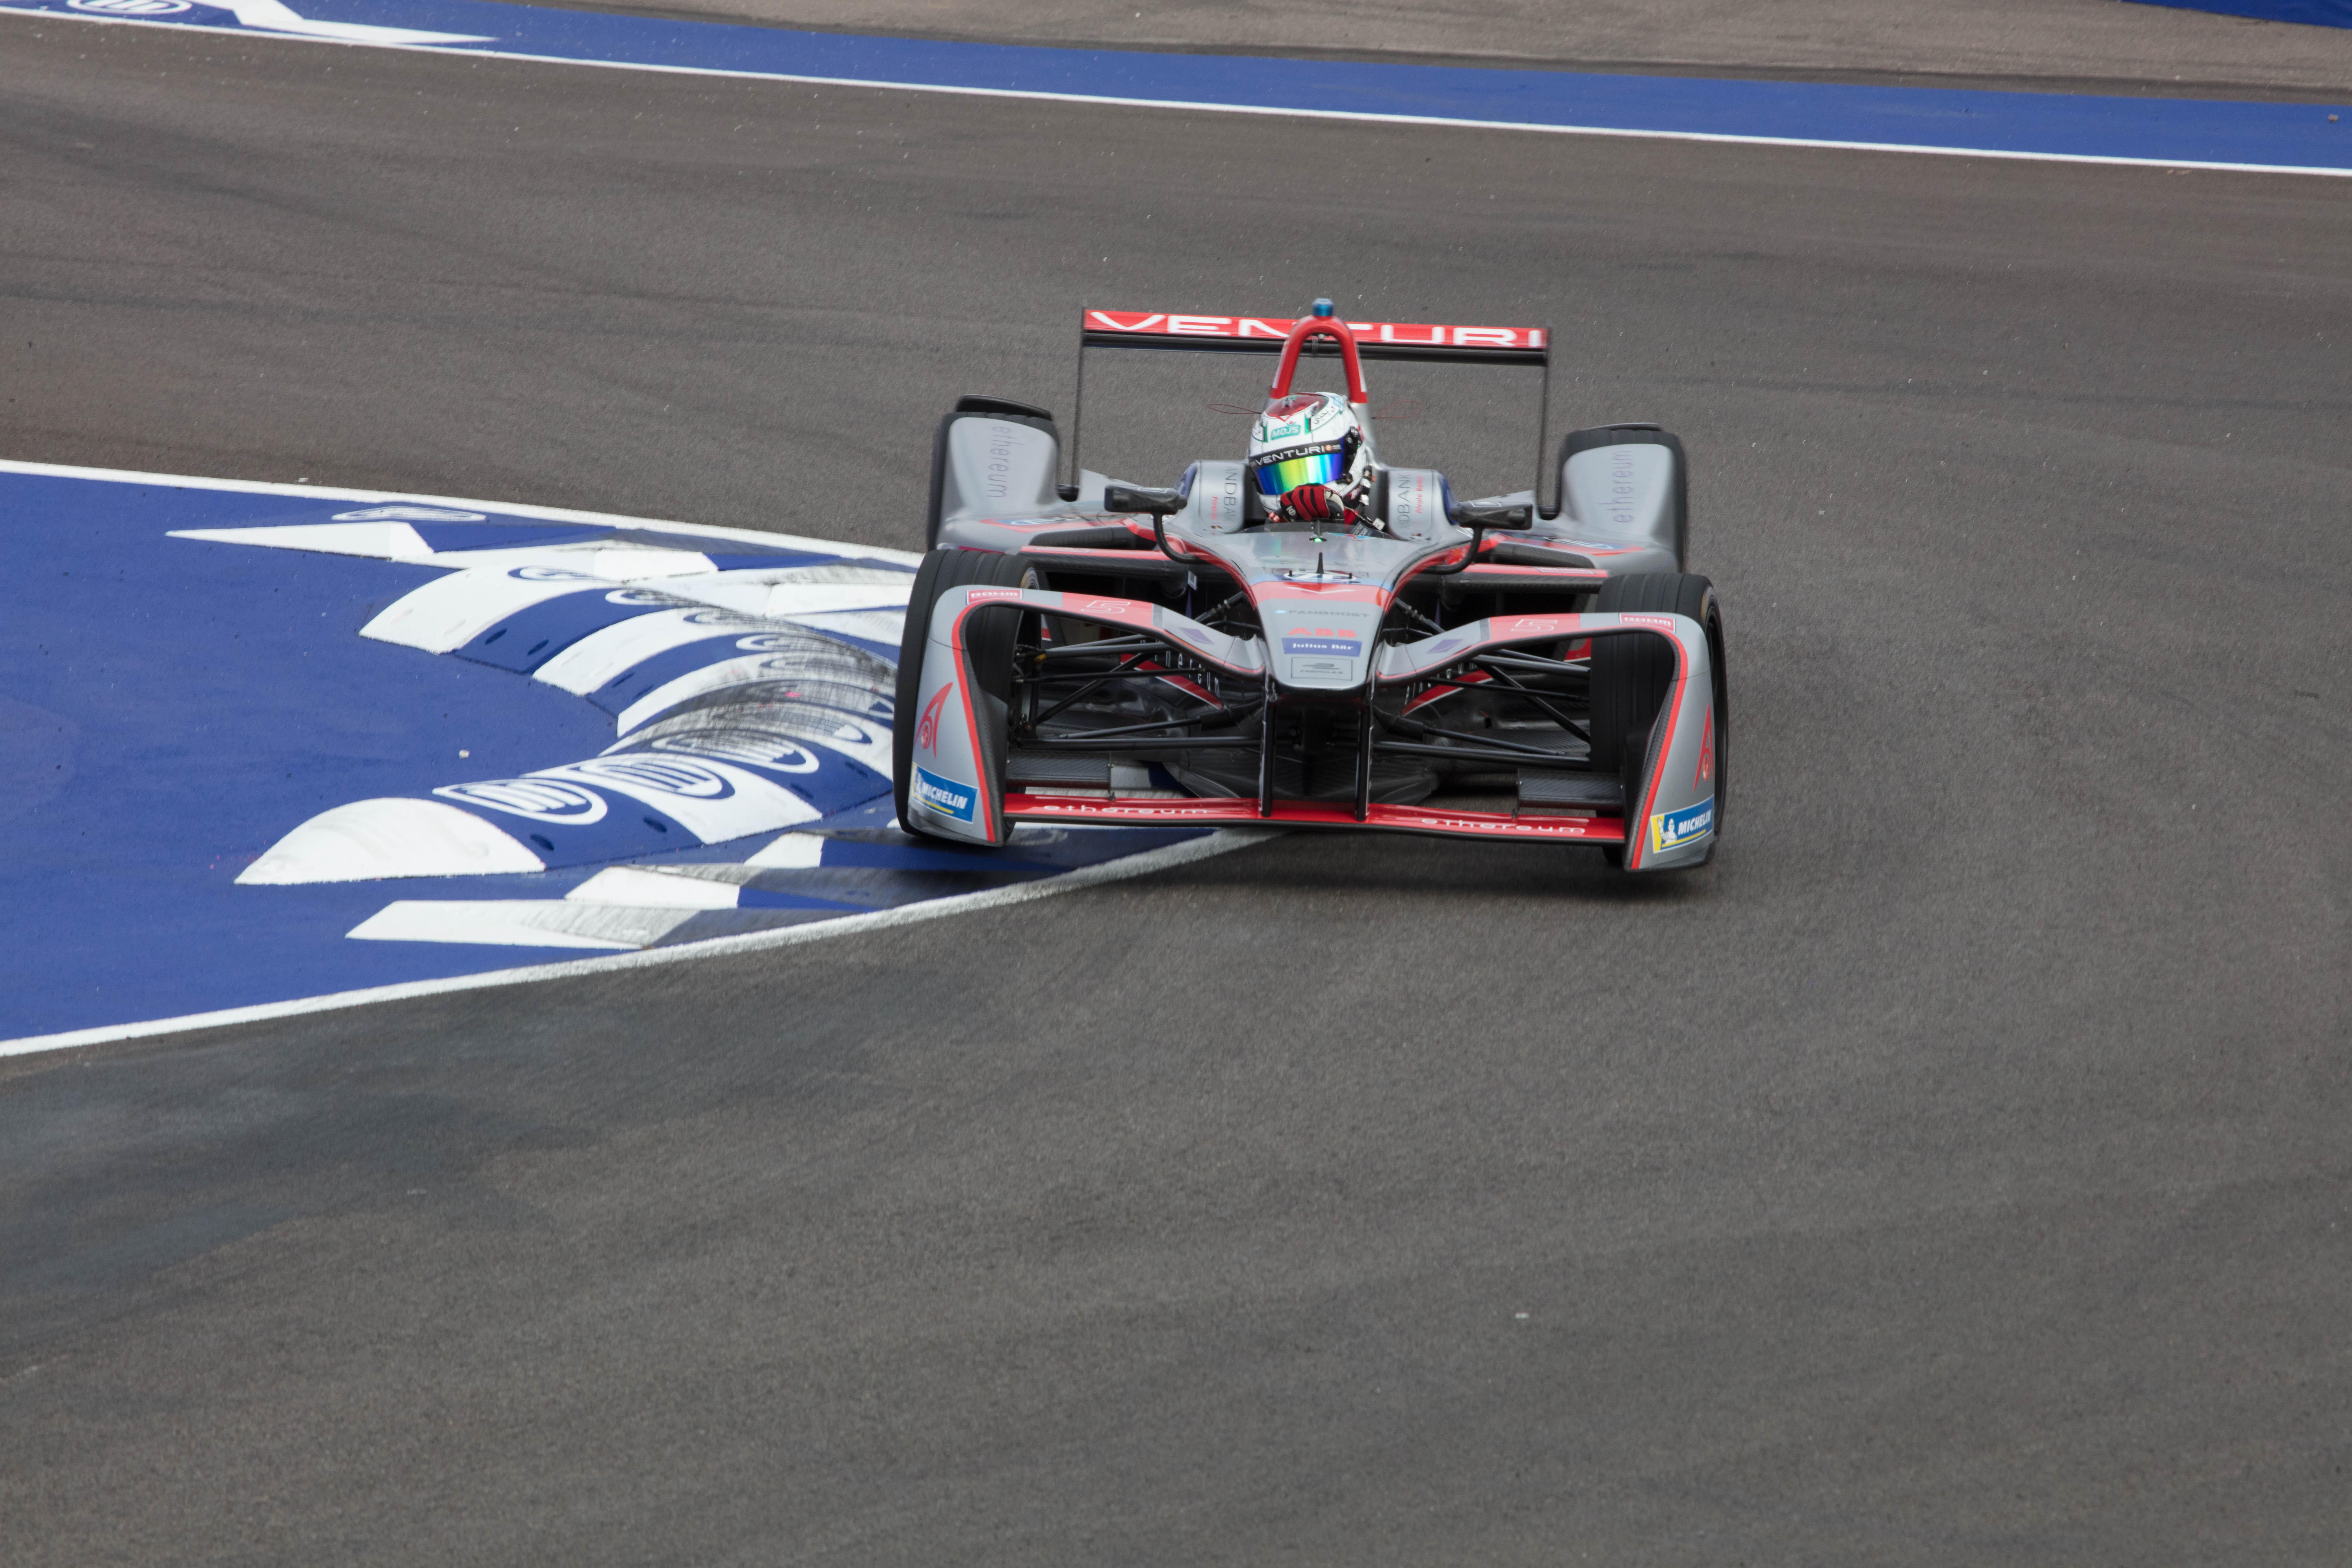 Le pilote Marocain Benyahia lors des Rookies test de la Formula E